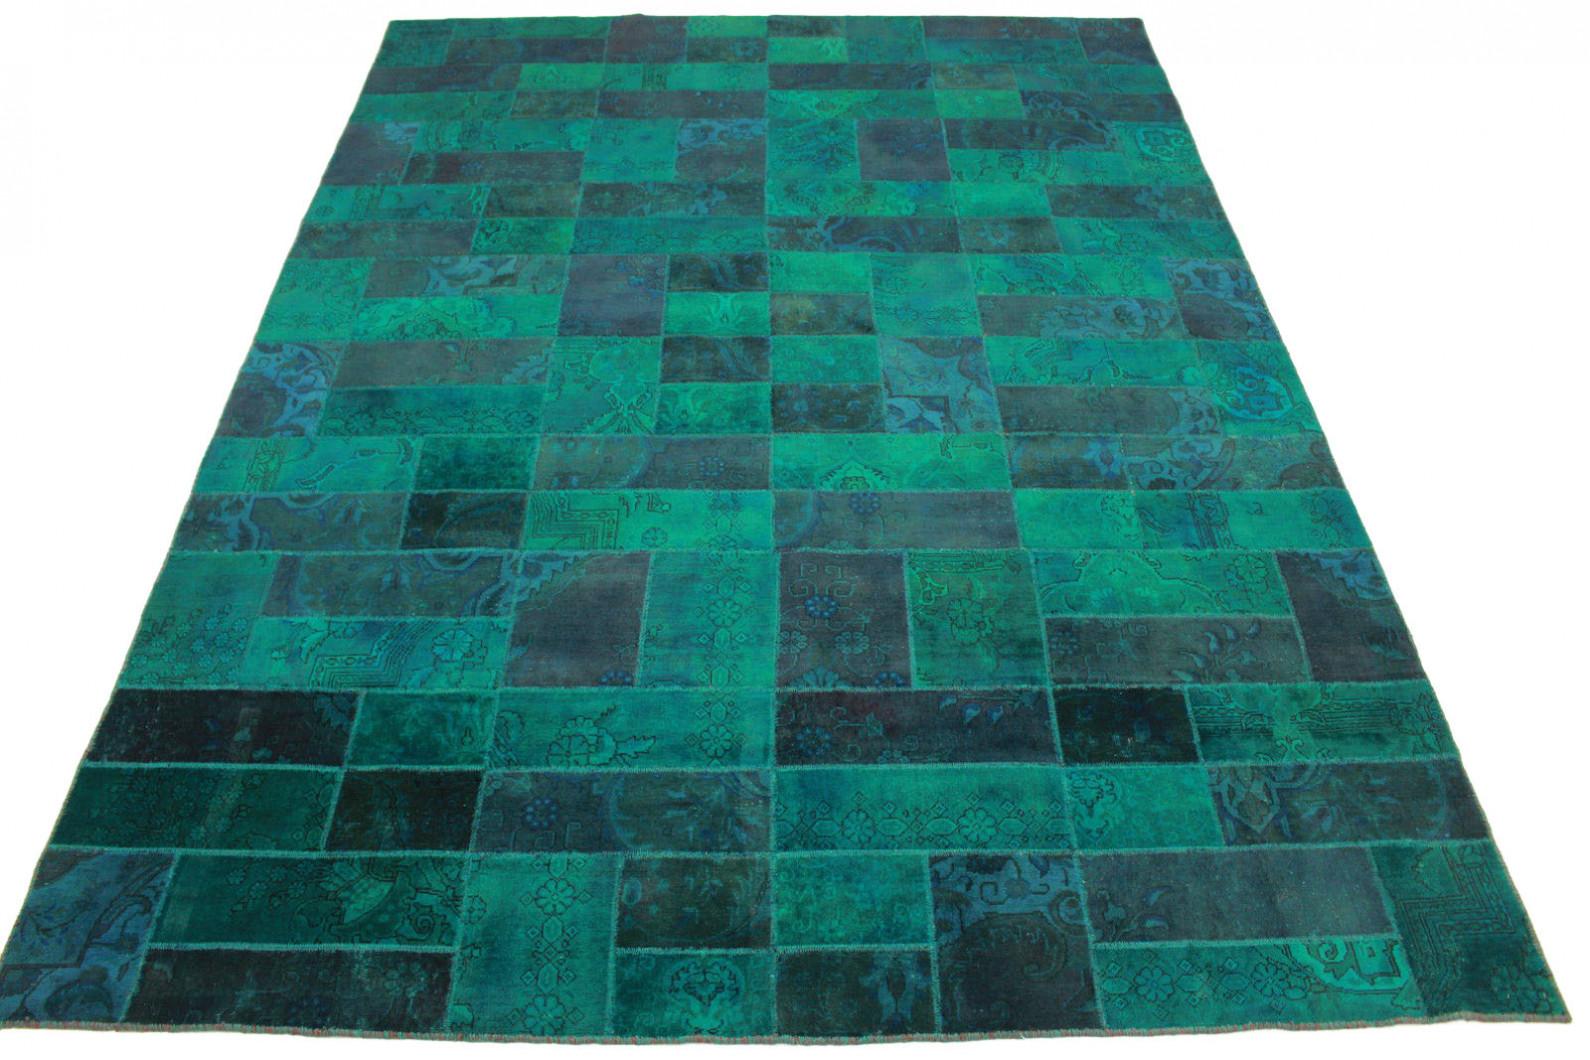 patchwork teppich blau t rkis in 400x300cm 1001 1843 bei. Black Bedroom Furniture Sets. Home Design Ideas